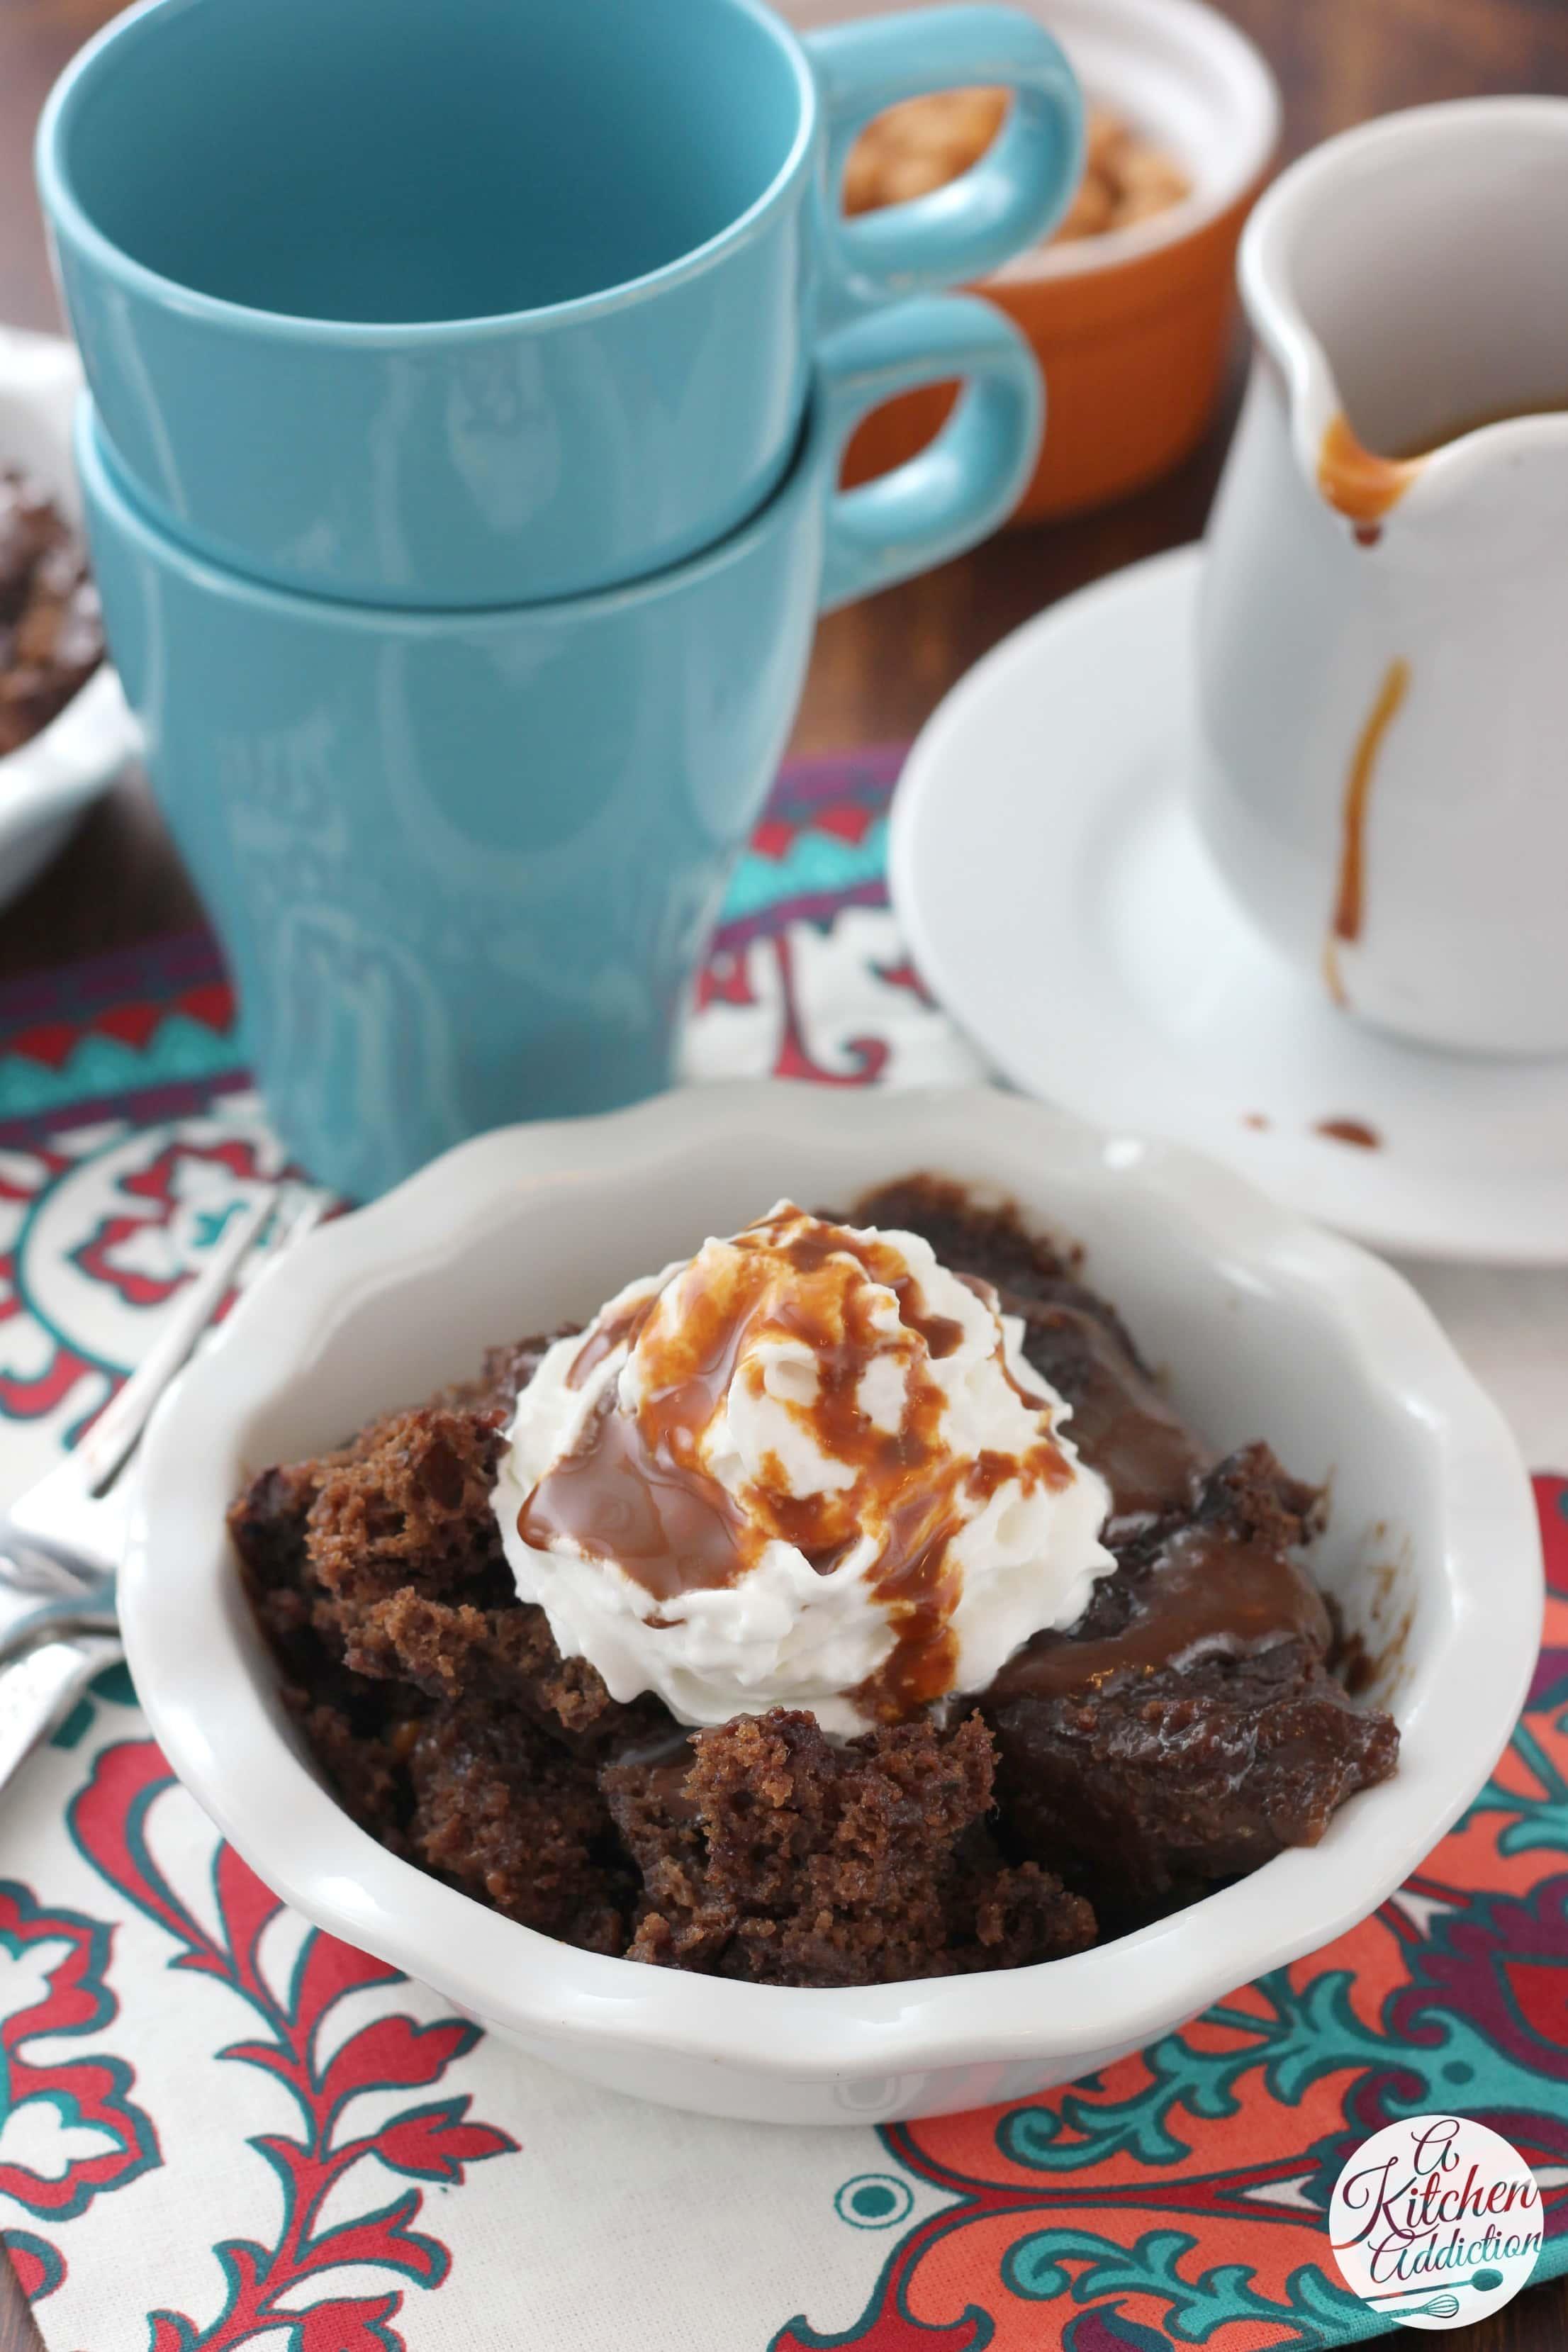 Slow Cooker Chocolate Caramel Pudding Cake A Kitchen Addiction